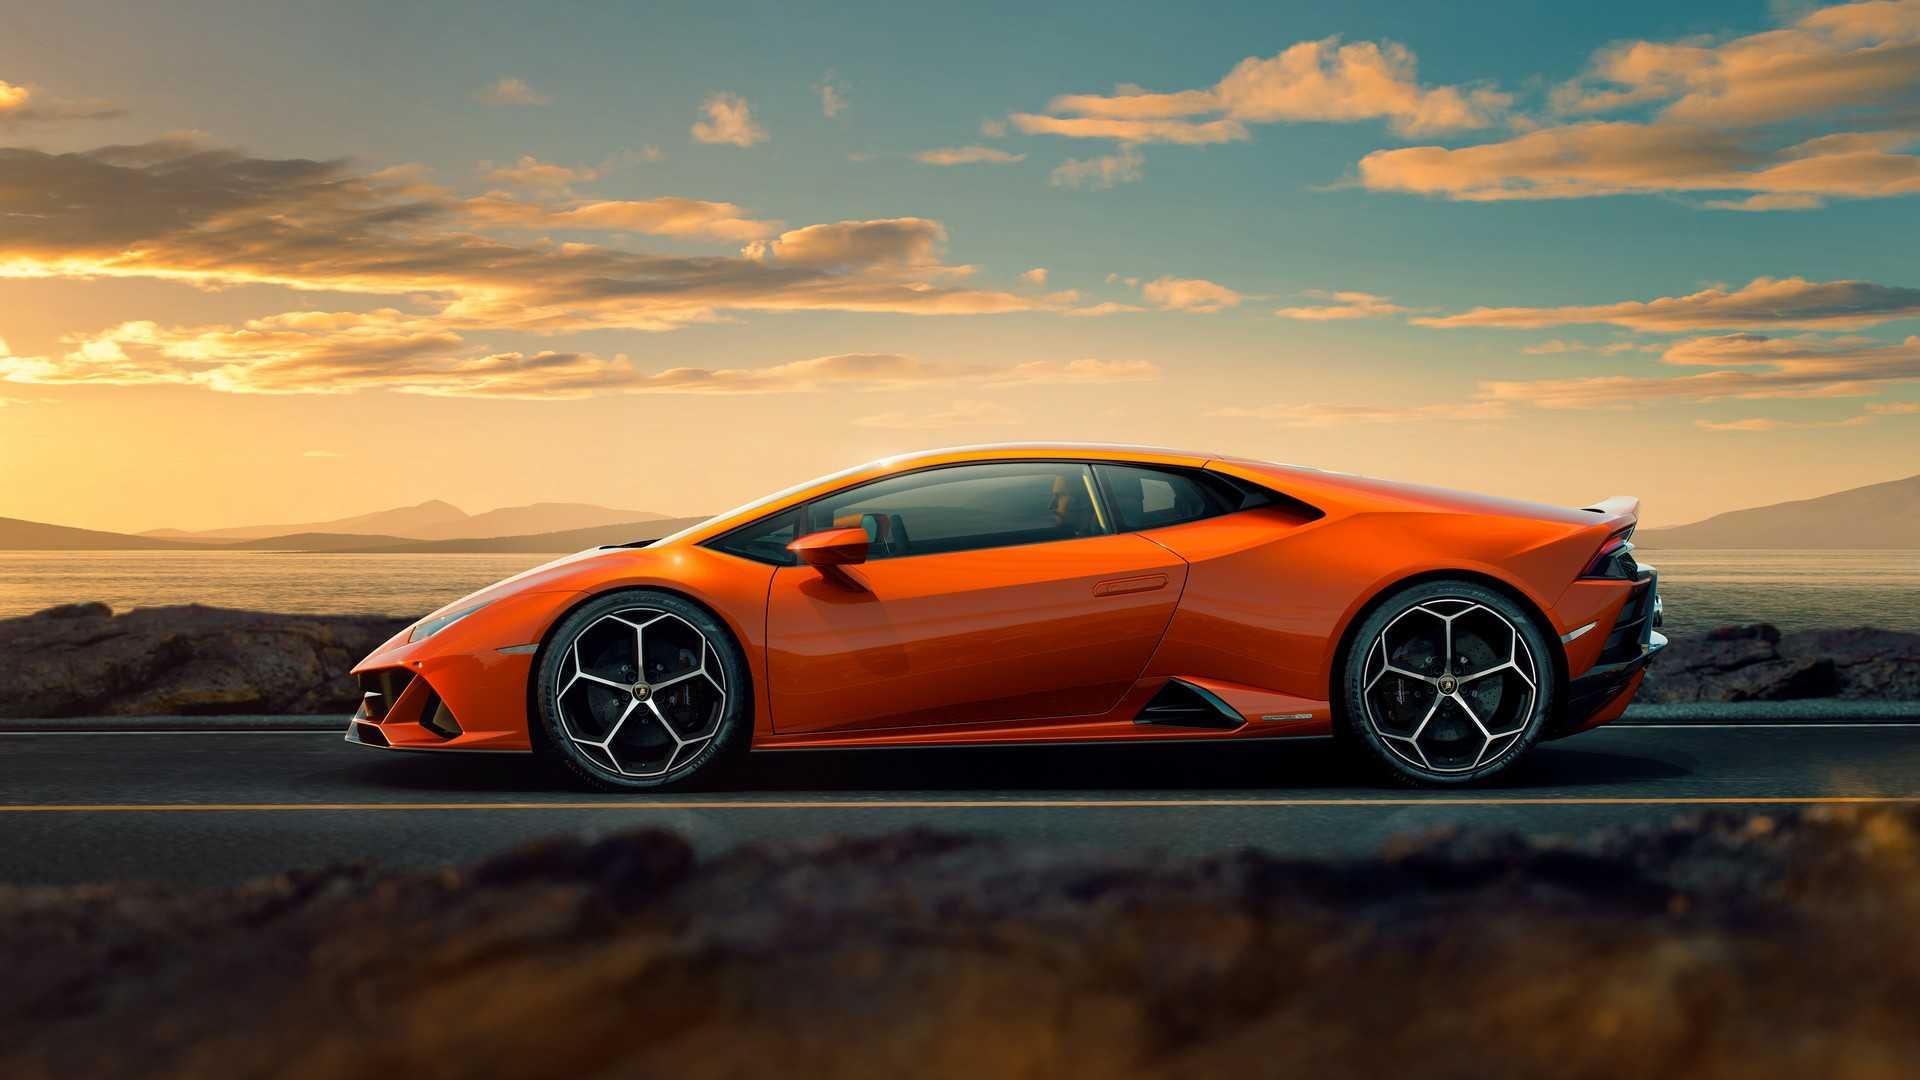 Lamborghini Huracan Evo Vorgestellt Facelift Des V10 Bullen Alles